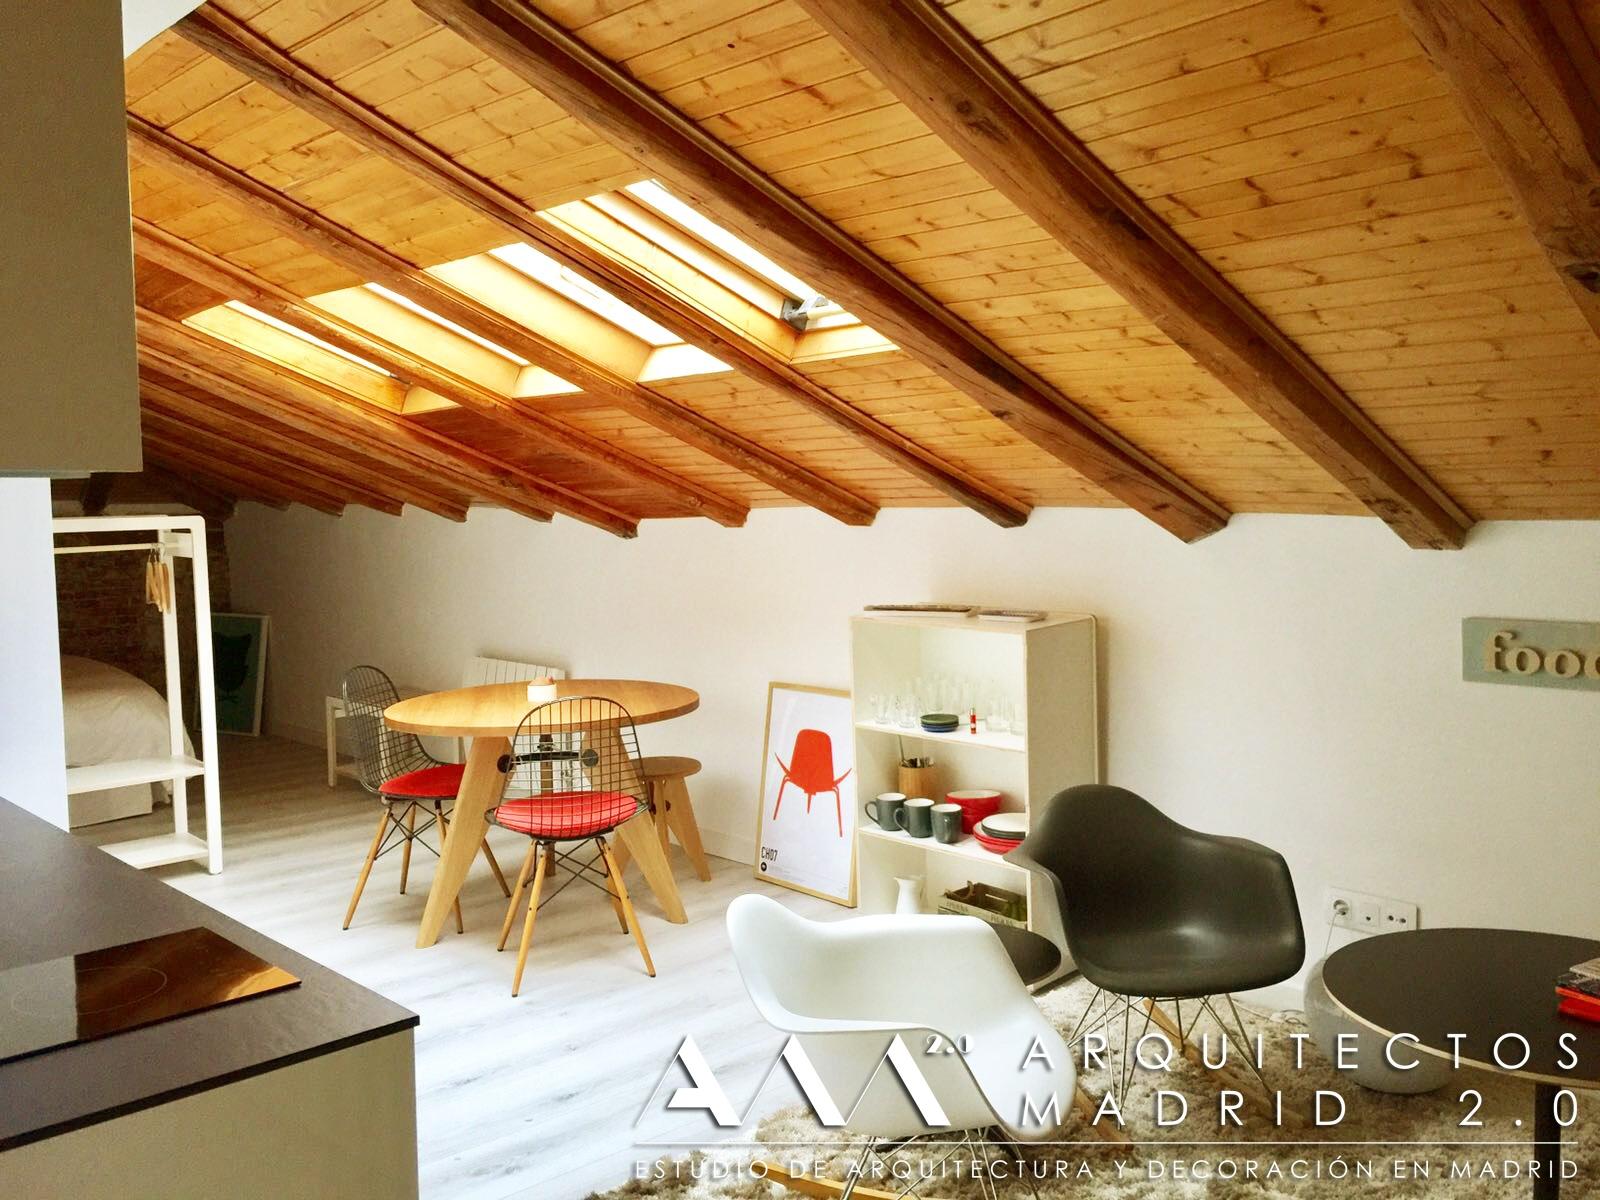 solado-laminado-imitacion-madera-sobre-pavimento-existente